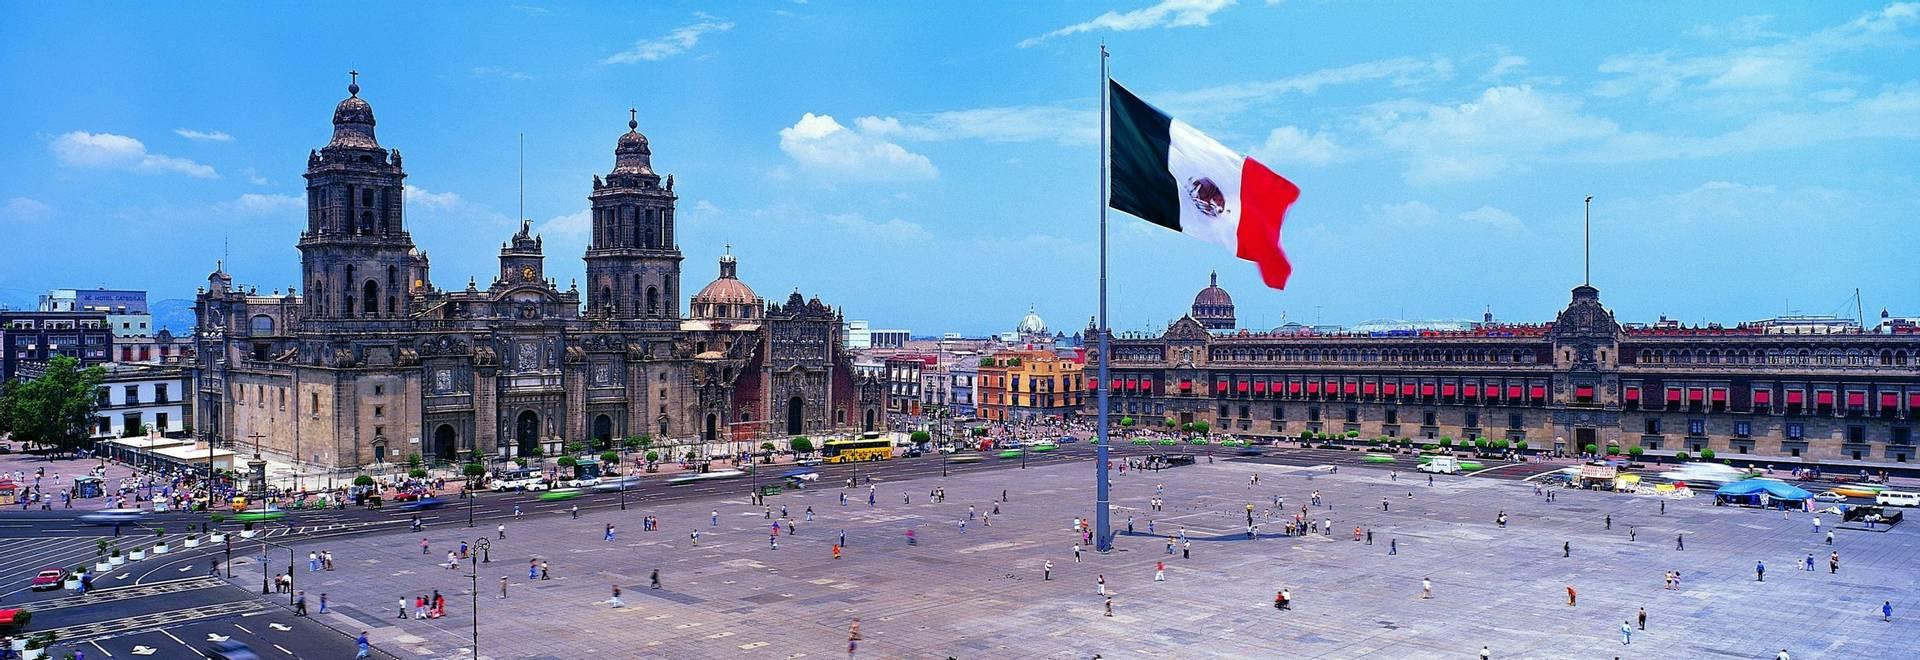 GettyImages-dv604024 Zocalo, Mexico City.jpg